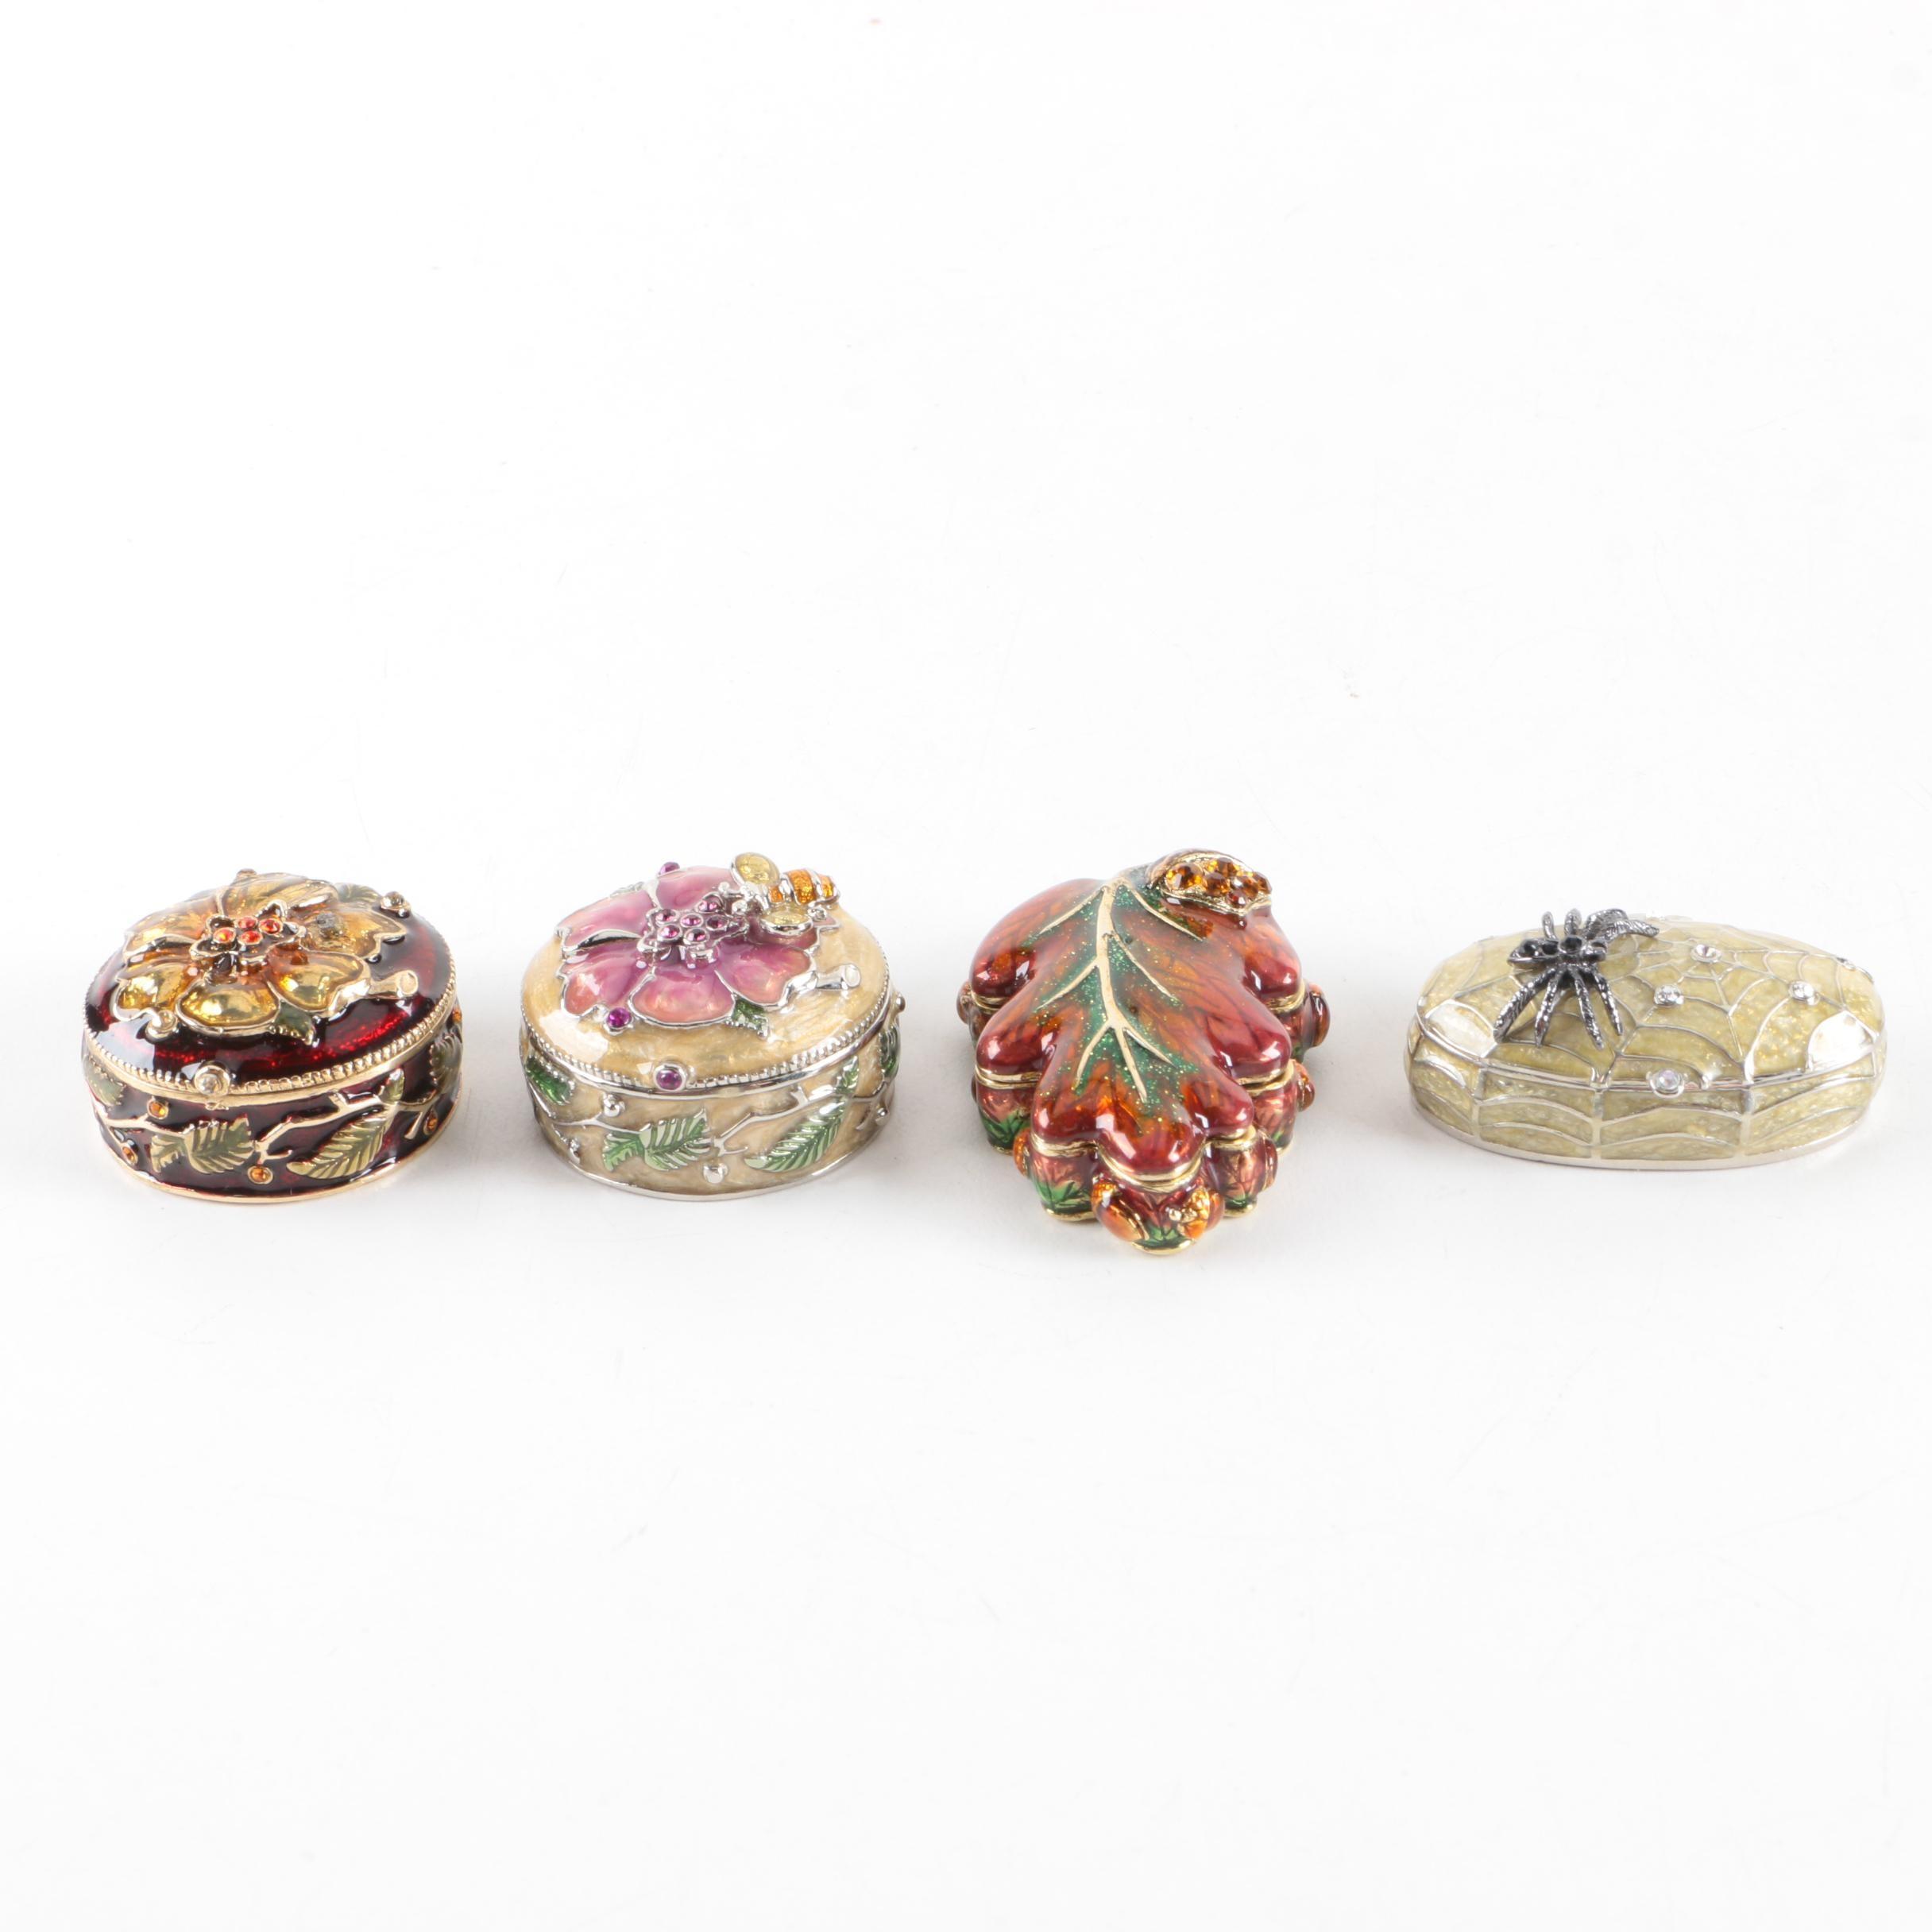 Enameled Trinket Boxes by Monet